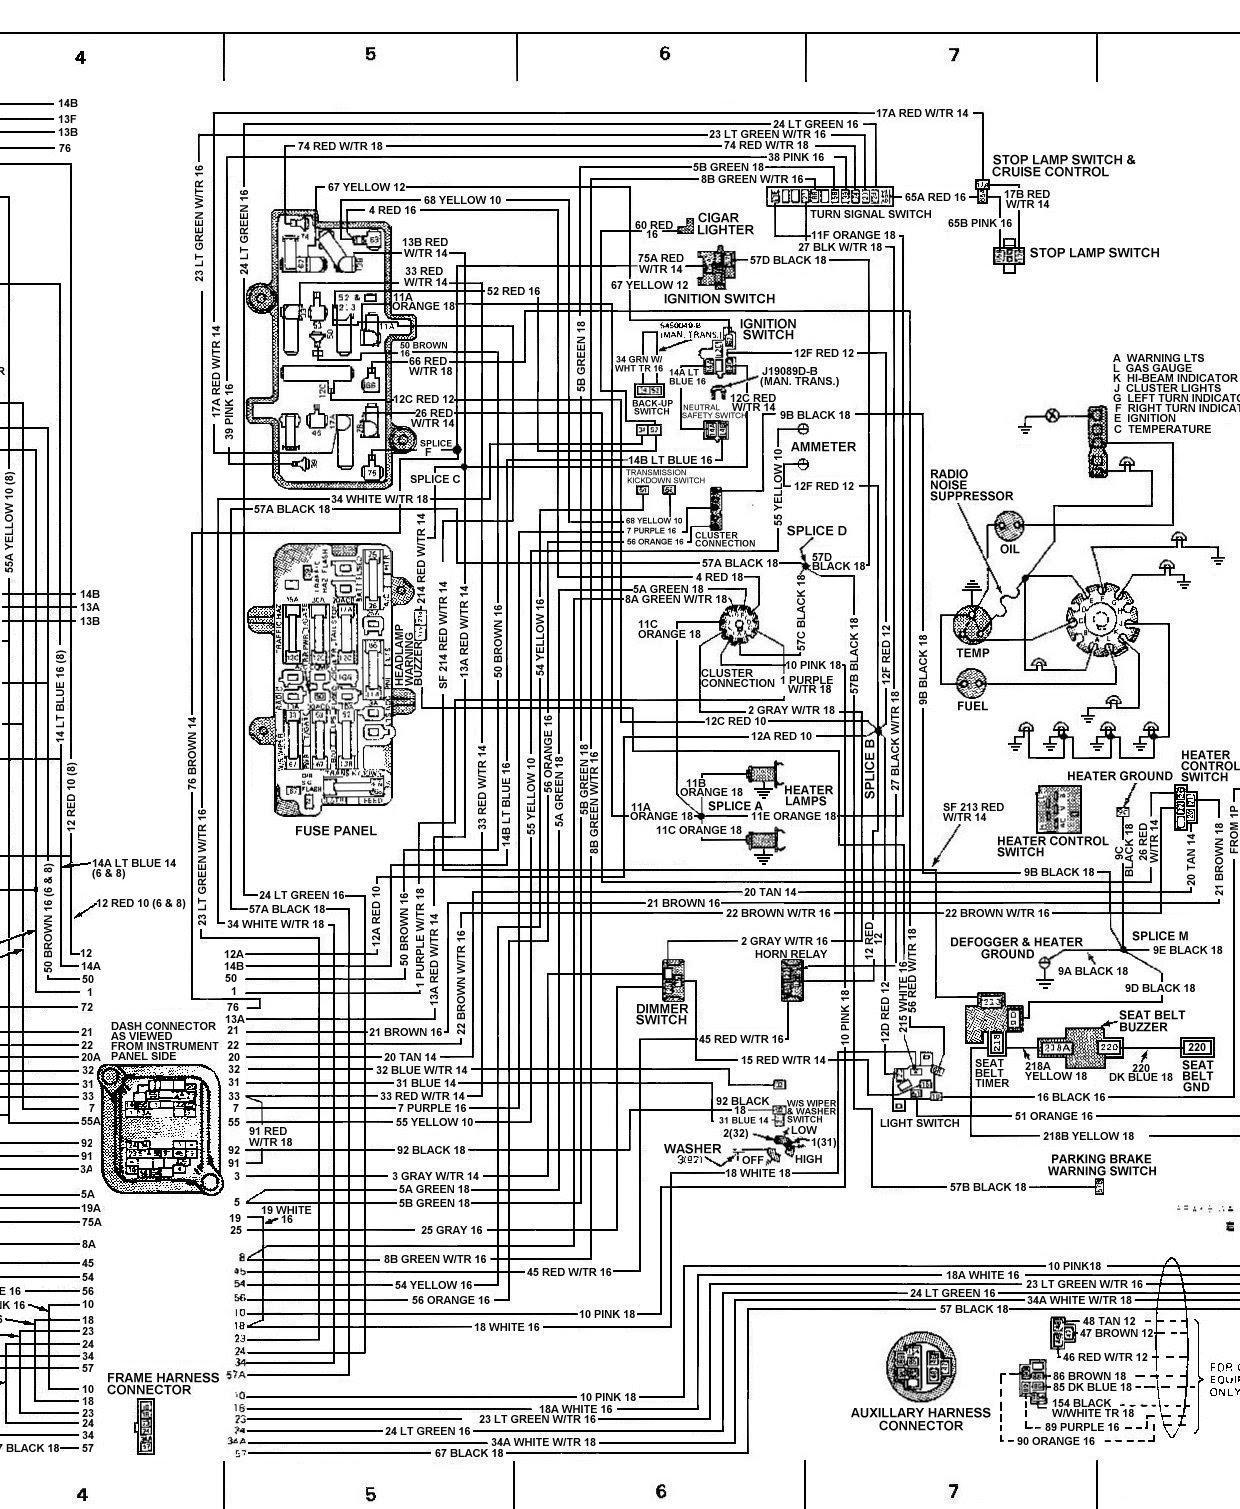 2007 Dodge Caliber Headlight Wiring Diagram from i0.wp.com